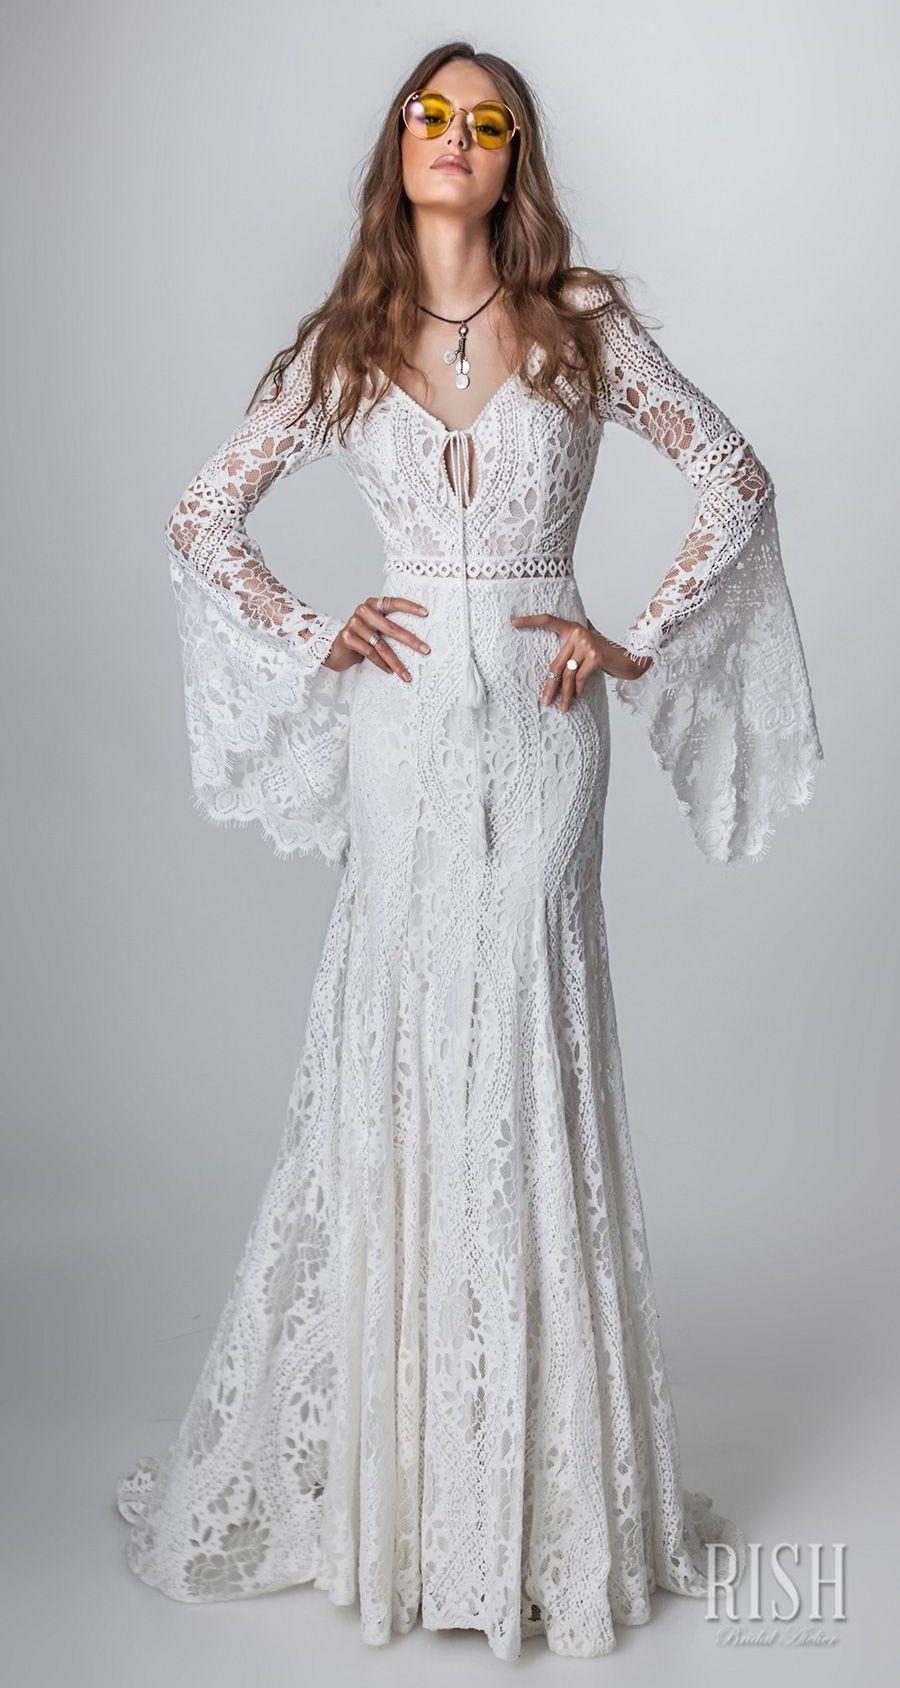 Rish Bridal Sun Dance 2018 Long Bell Sleeves V Neck Full Embellishment Bohemian Modified A Line Boho Chic Wedding Dress Chic Wedding Gown Chic Wedding Dresses